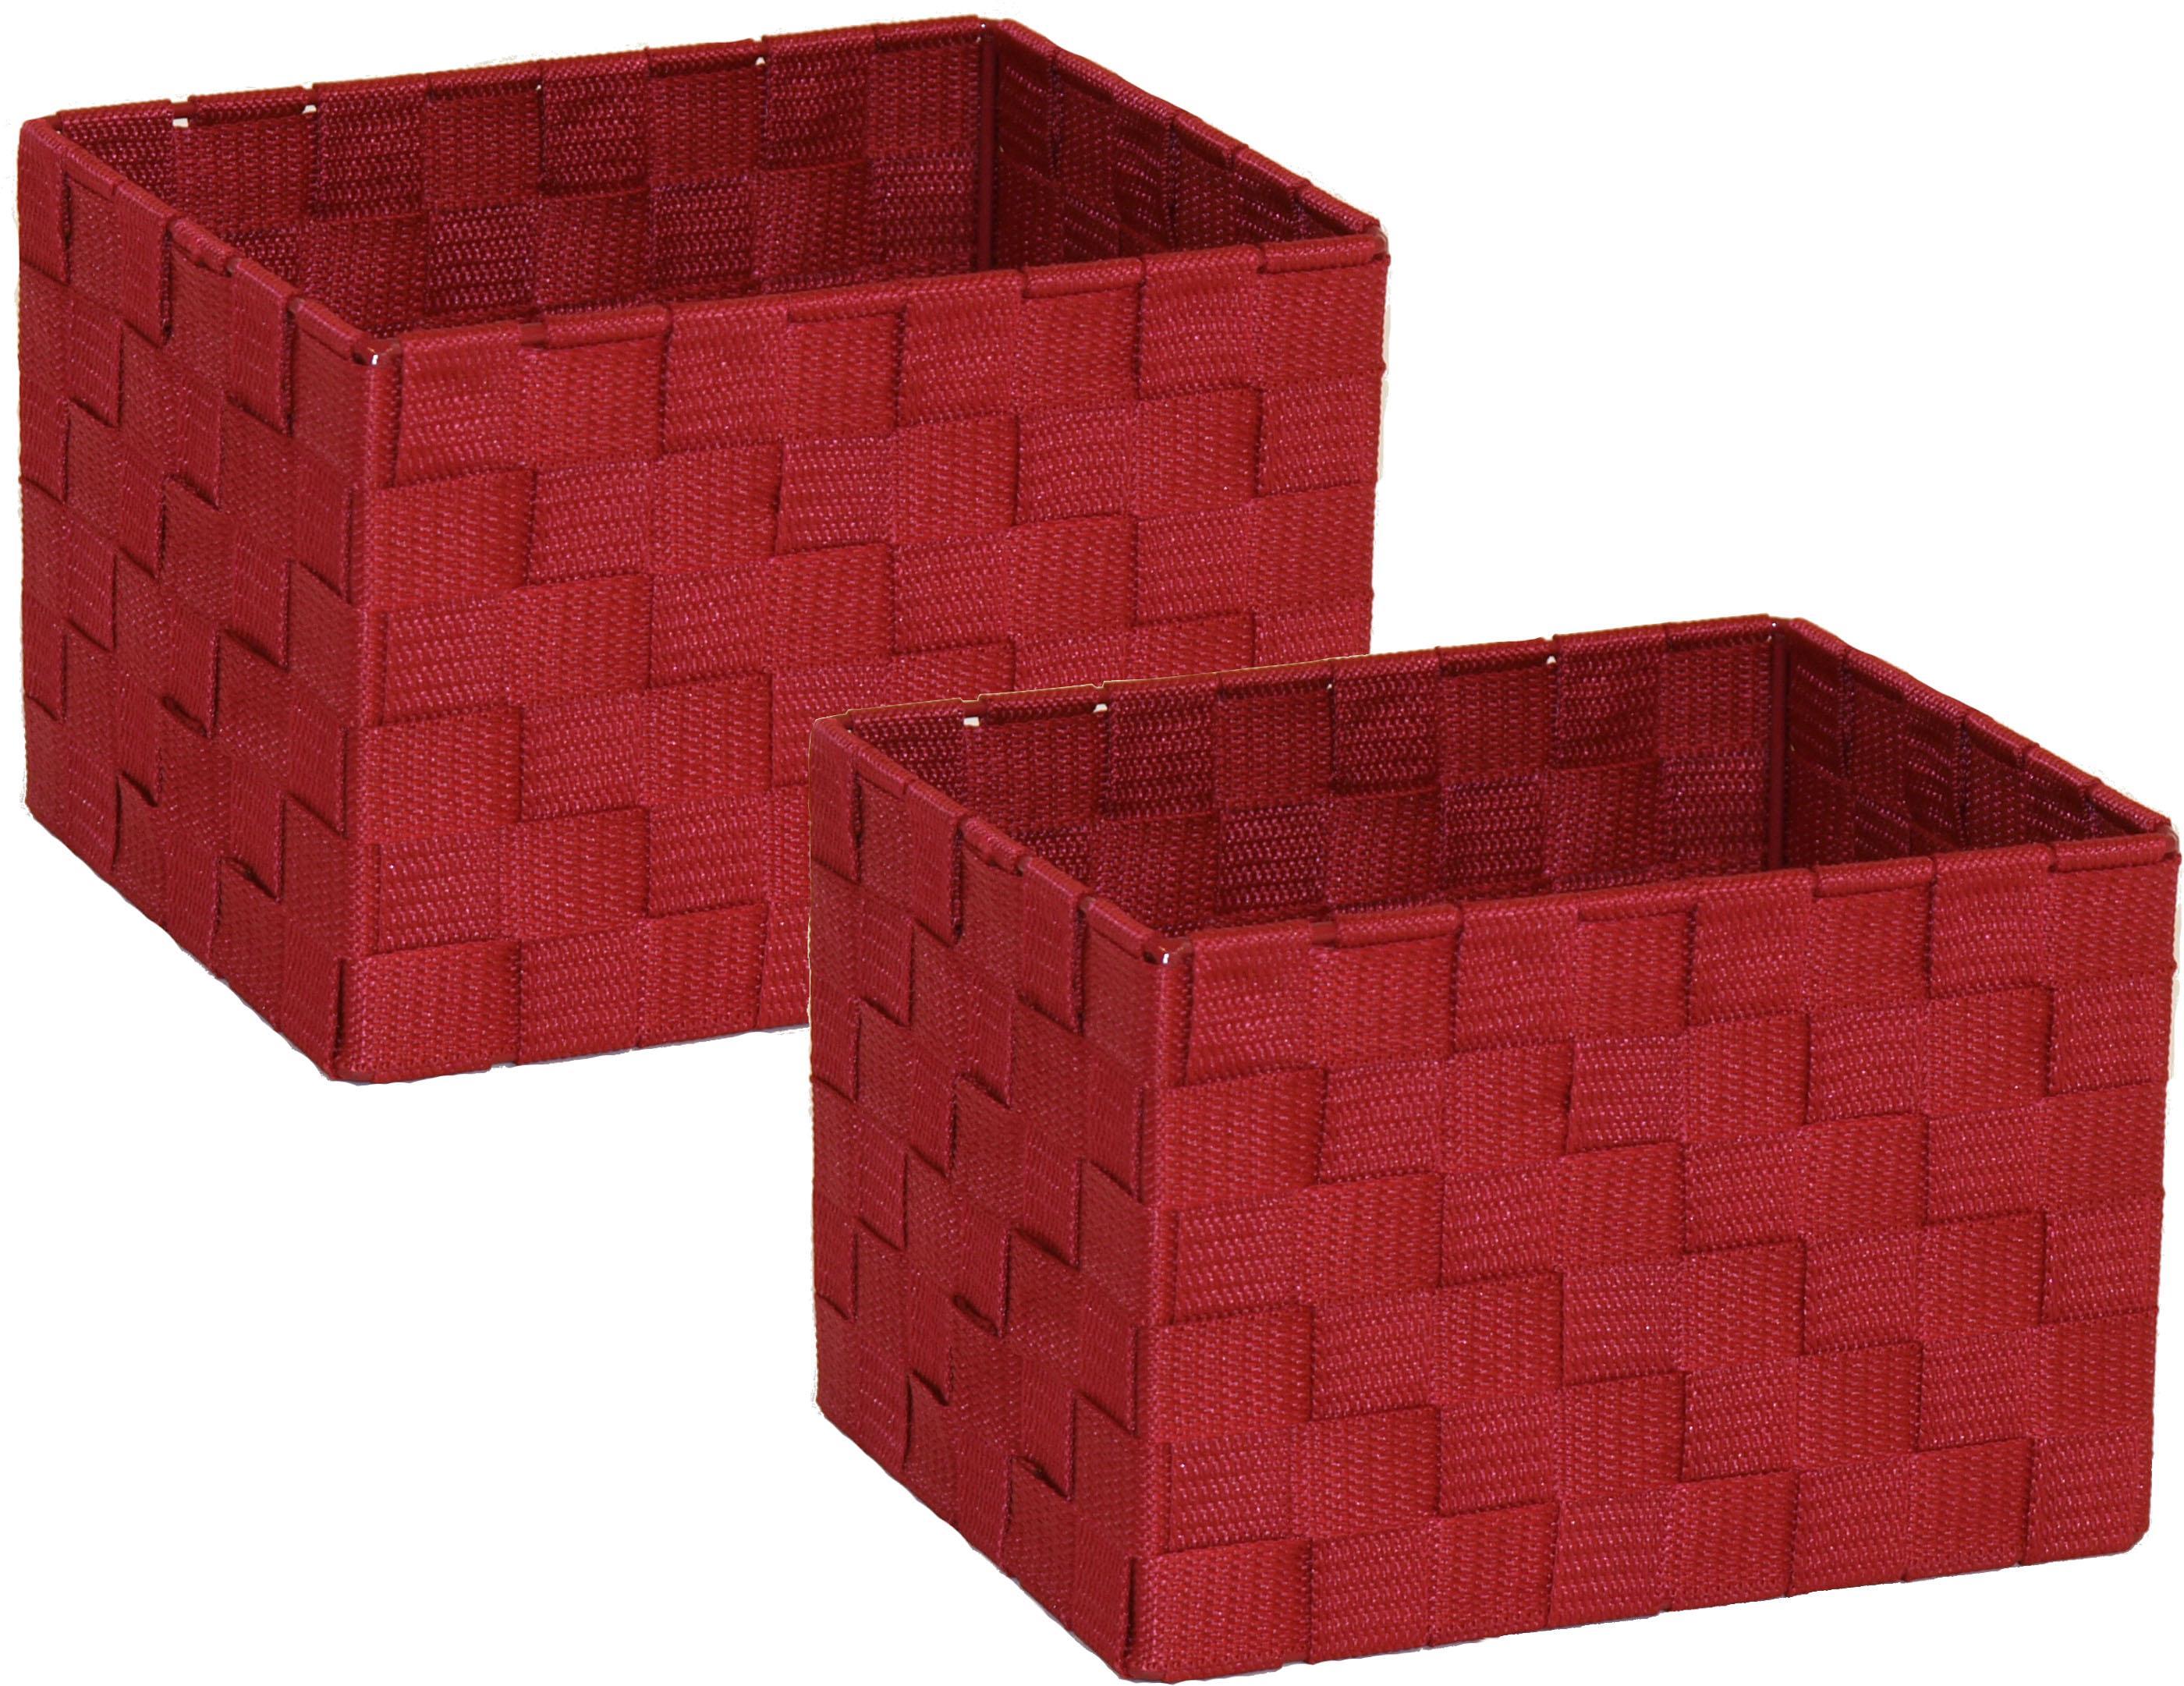 Franz Müller Flechtwaren Aufbewahrungsbox, (Set, 2 St.), Gr. 23 x 18 cm rot Kleideraufbewahrung Aufbewahrung Ordnung Wohnaccessoires Aufbewahrungsbox